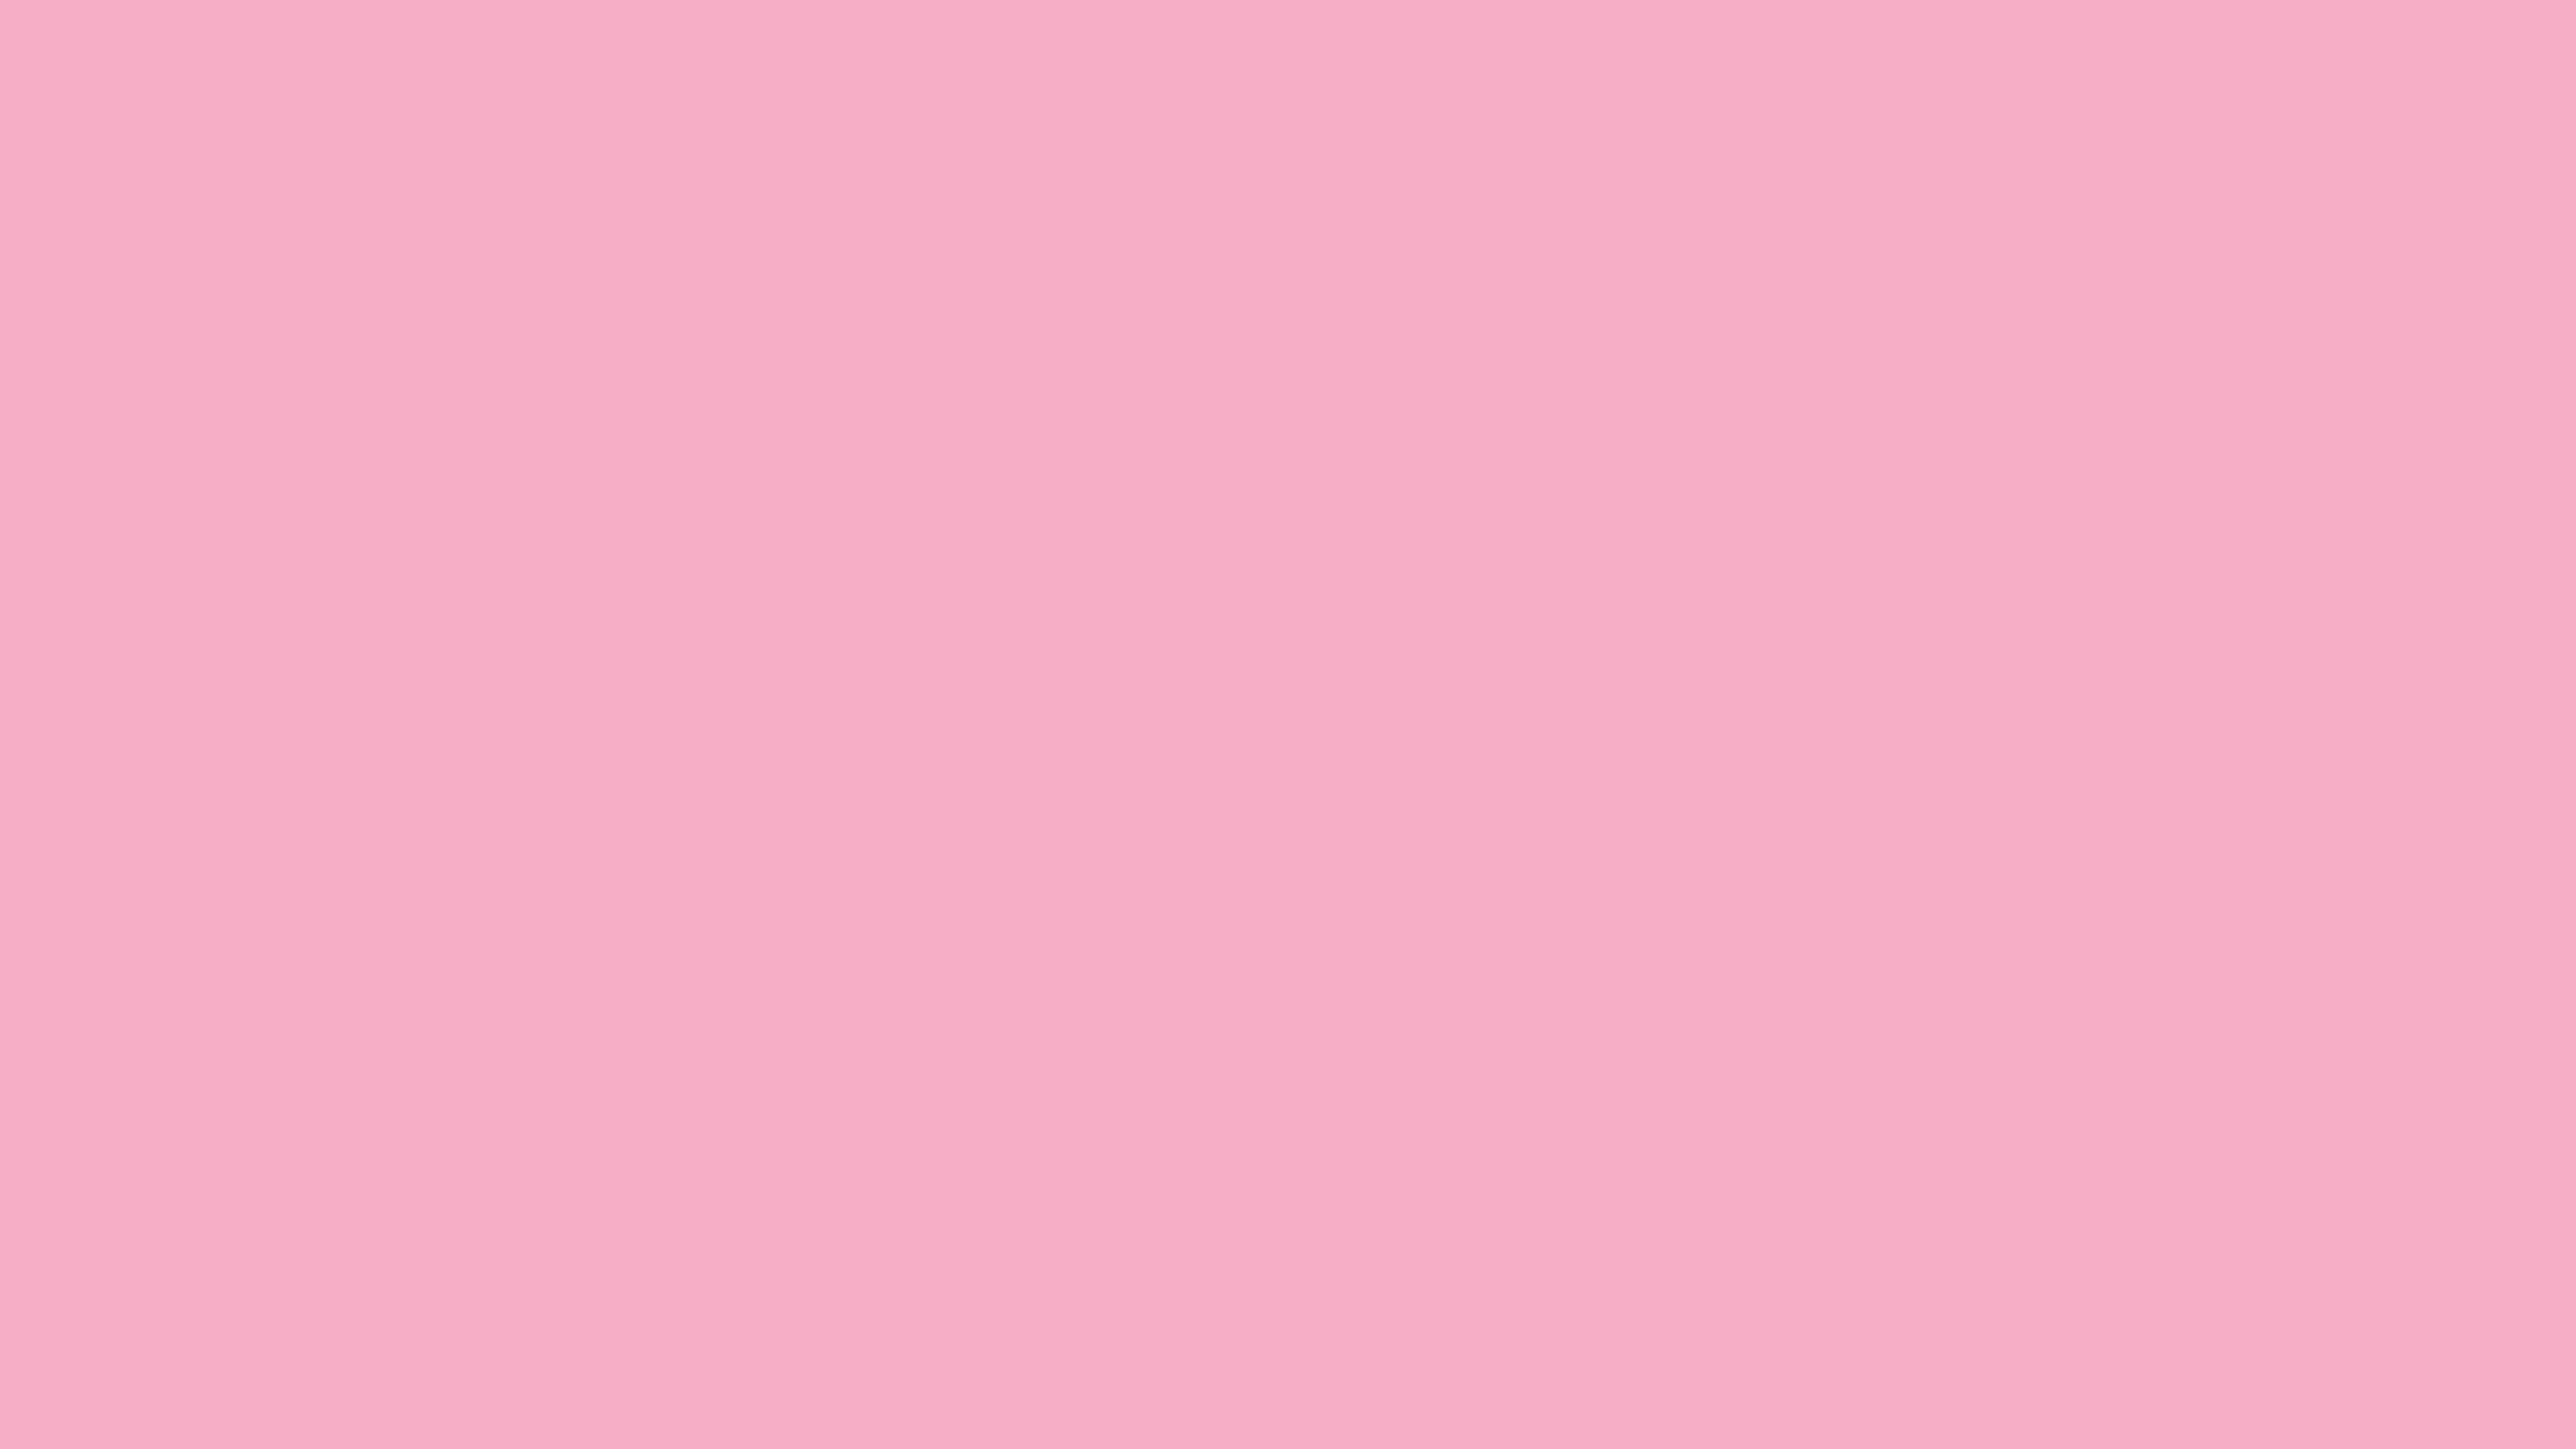 4096x2304 Nadeshiko Pink Solid Color Background